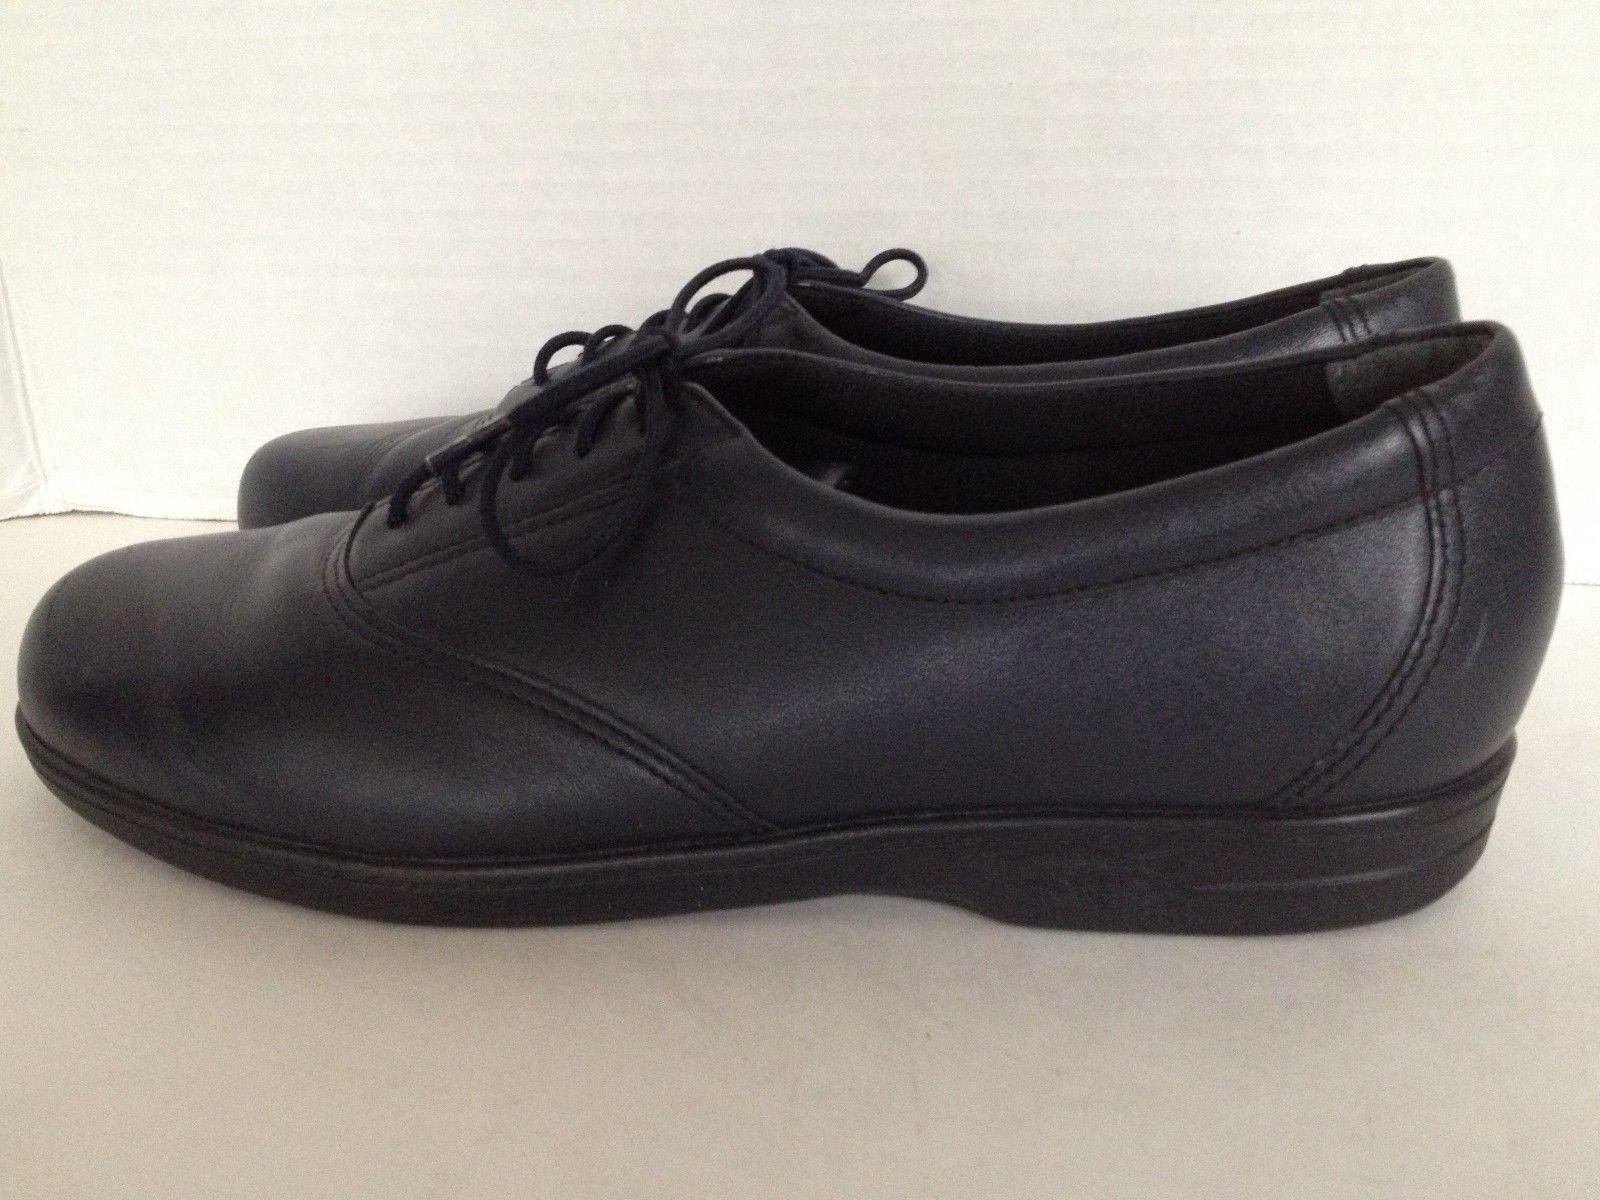 Sas Tripad Comfort Womens Shoes